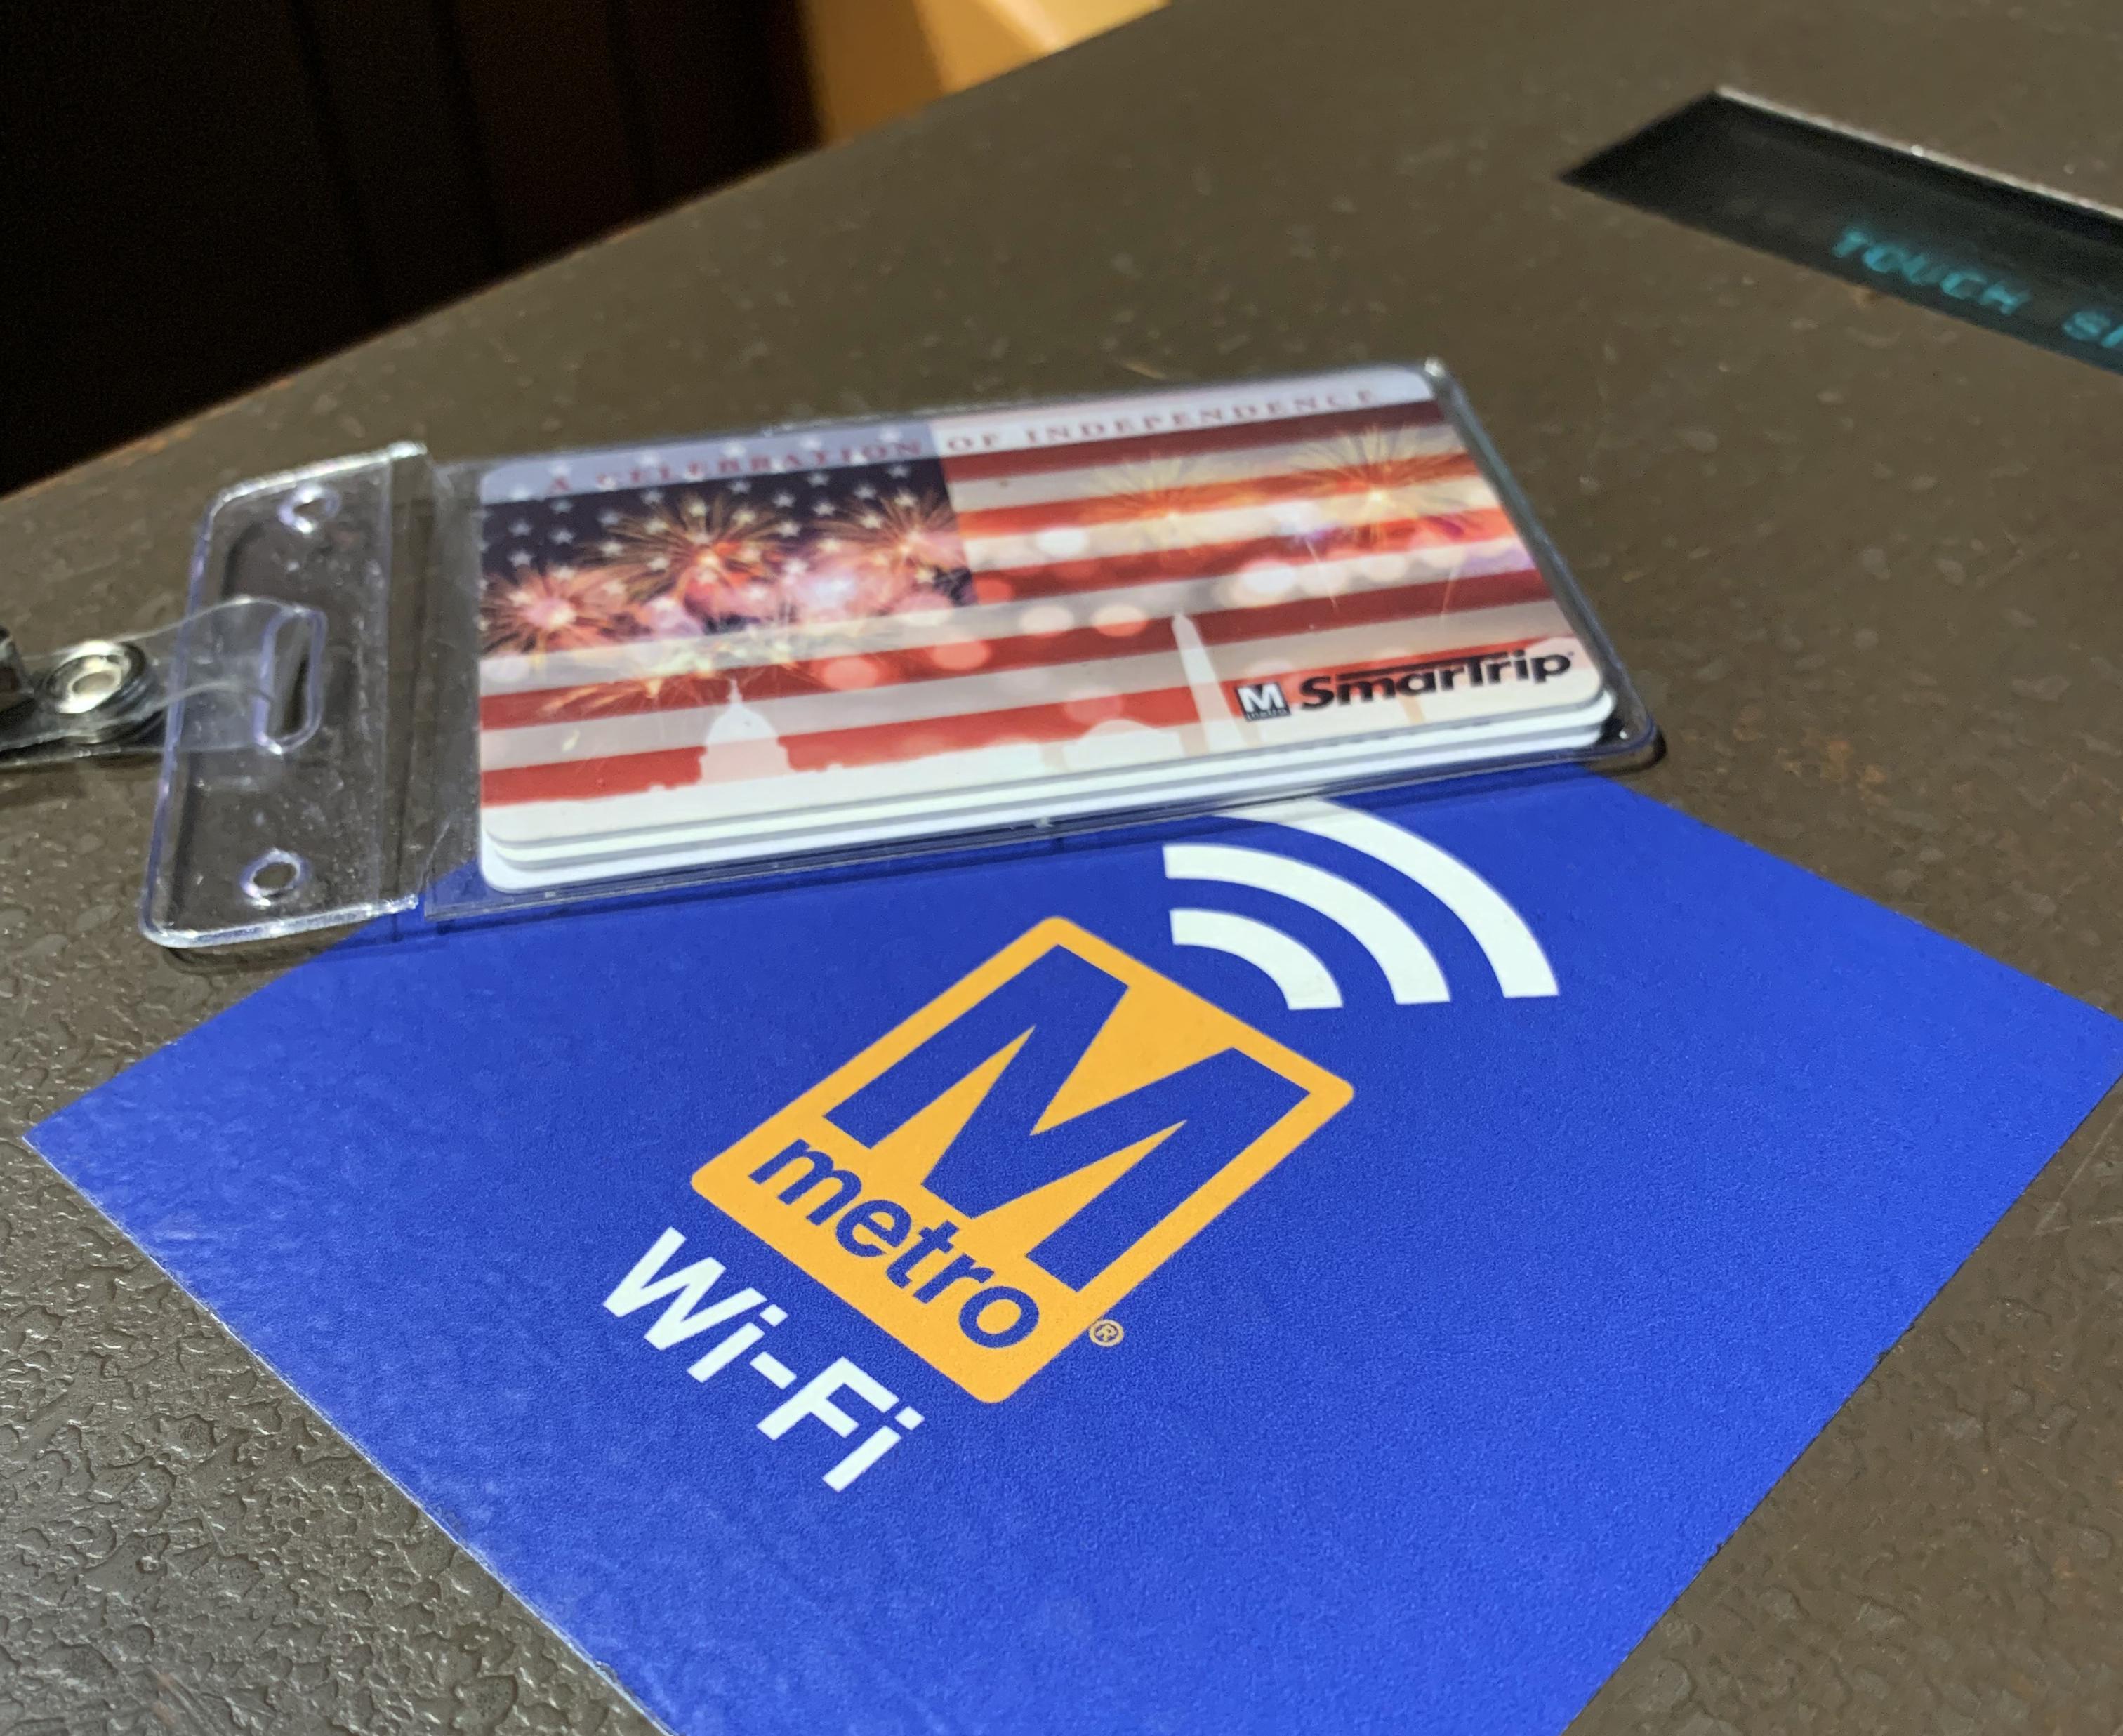 DC Metro WiFi Branding